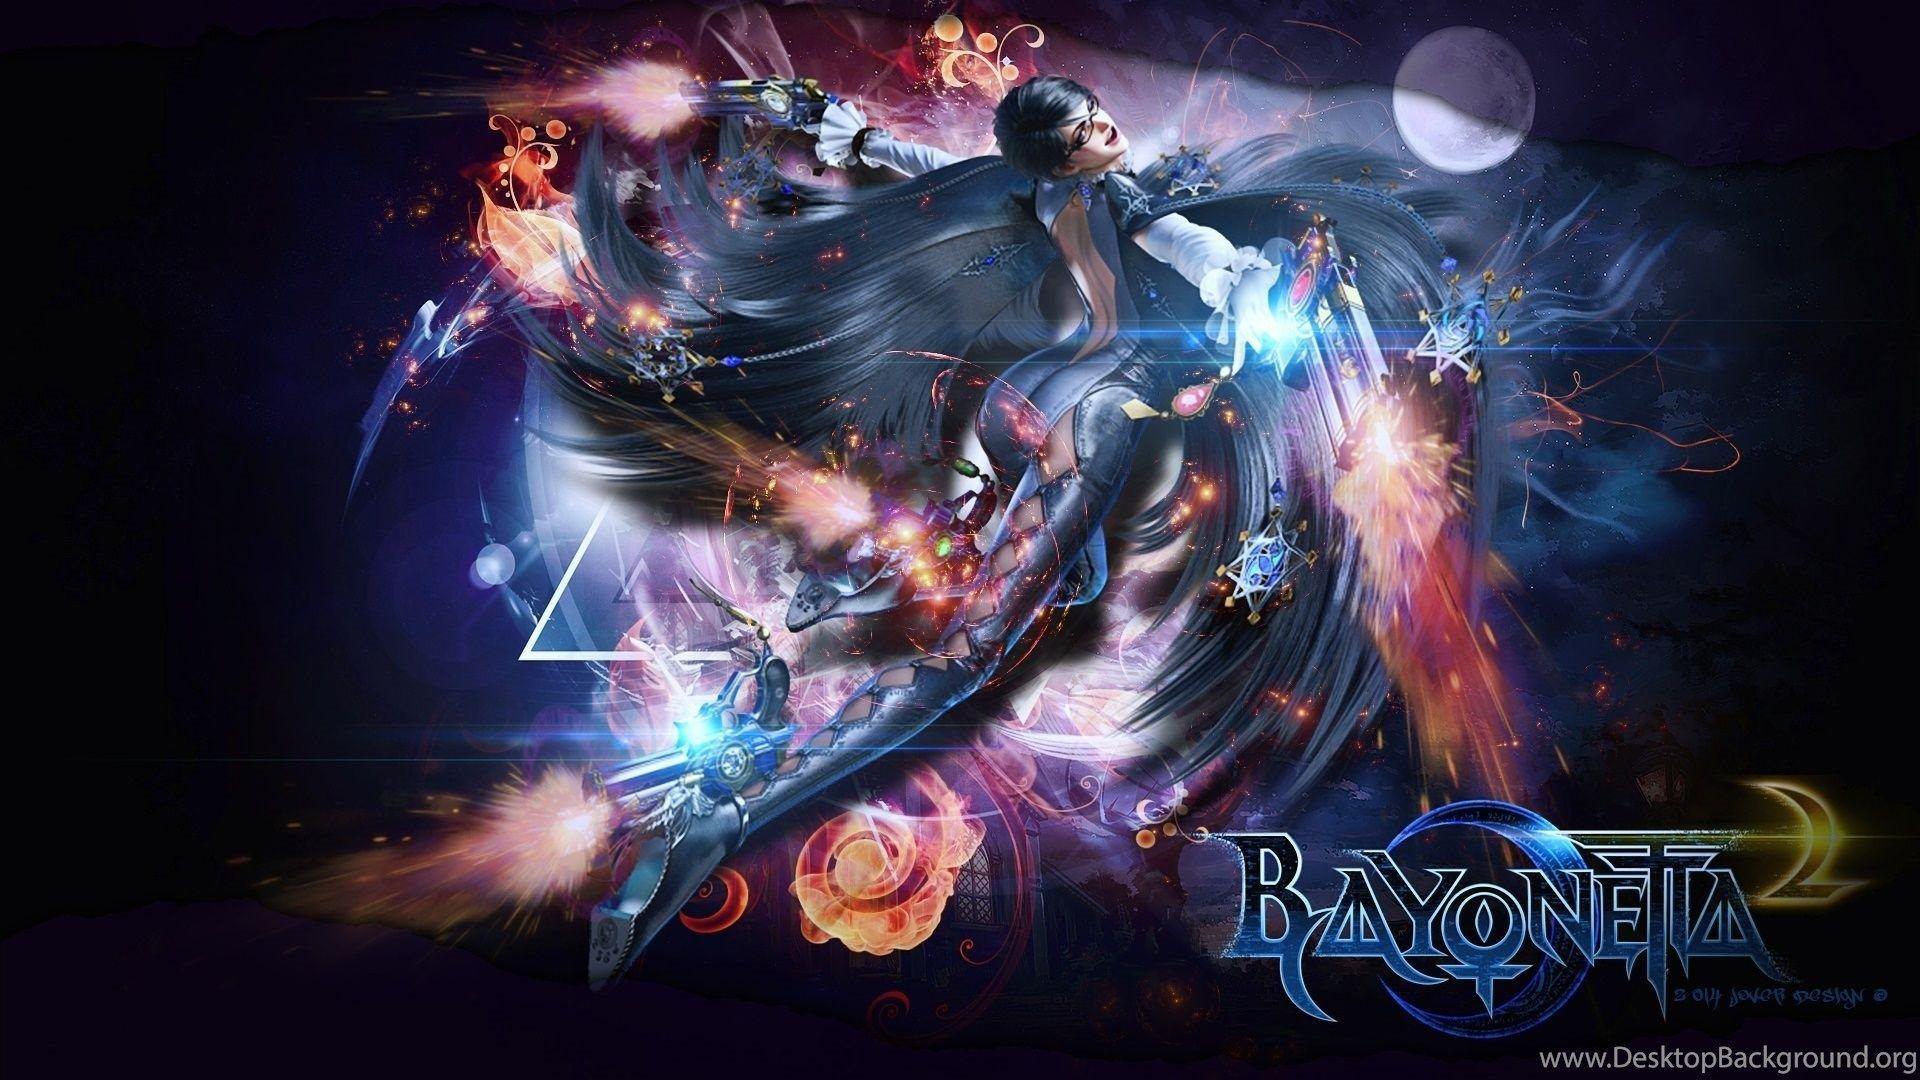 Bayonetta 2 Wallpapers